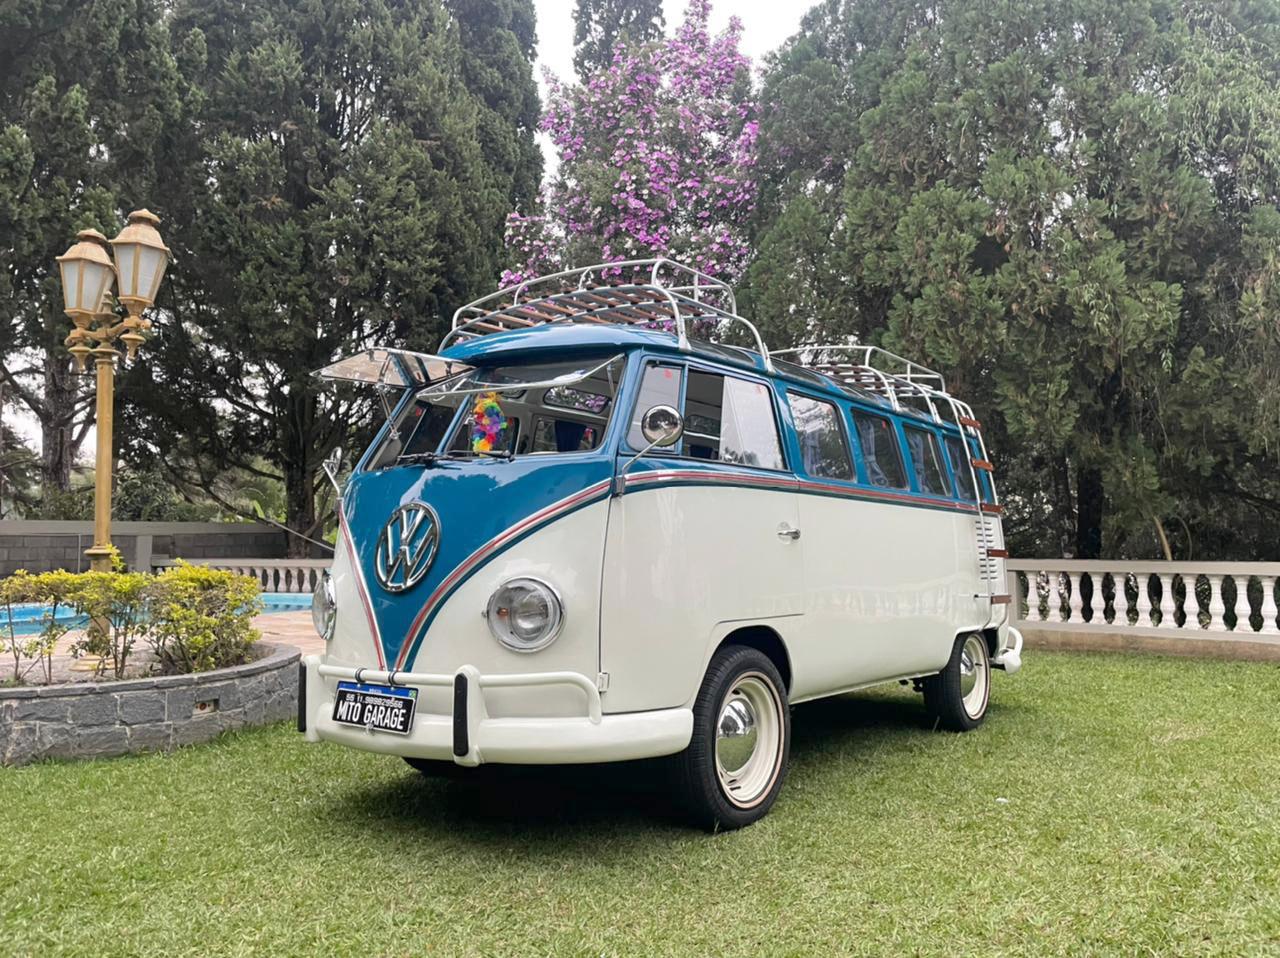 VW Kombi T1 Samba (Réplica) White and Blue 1969